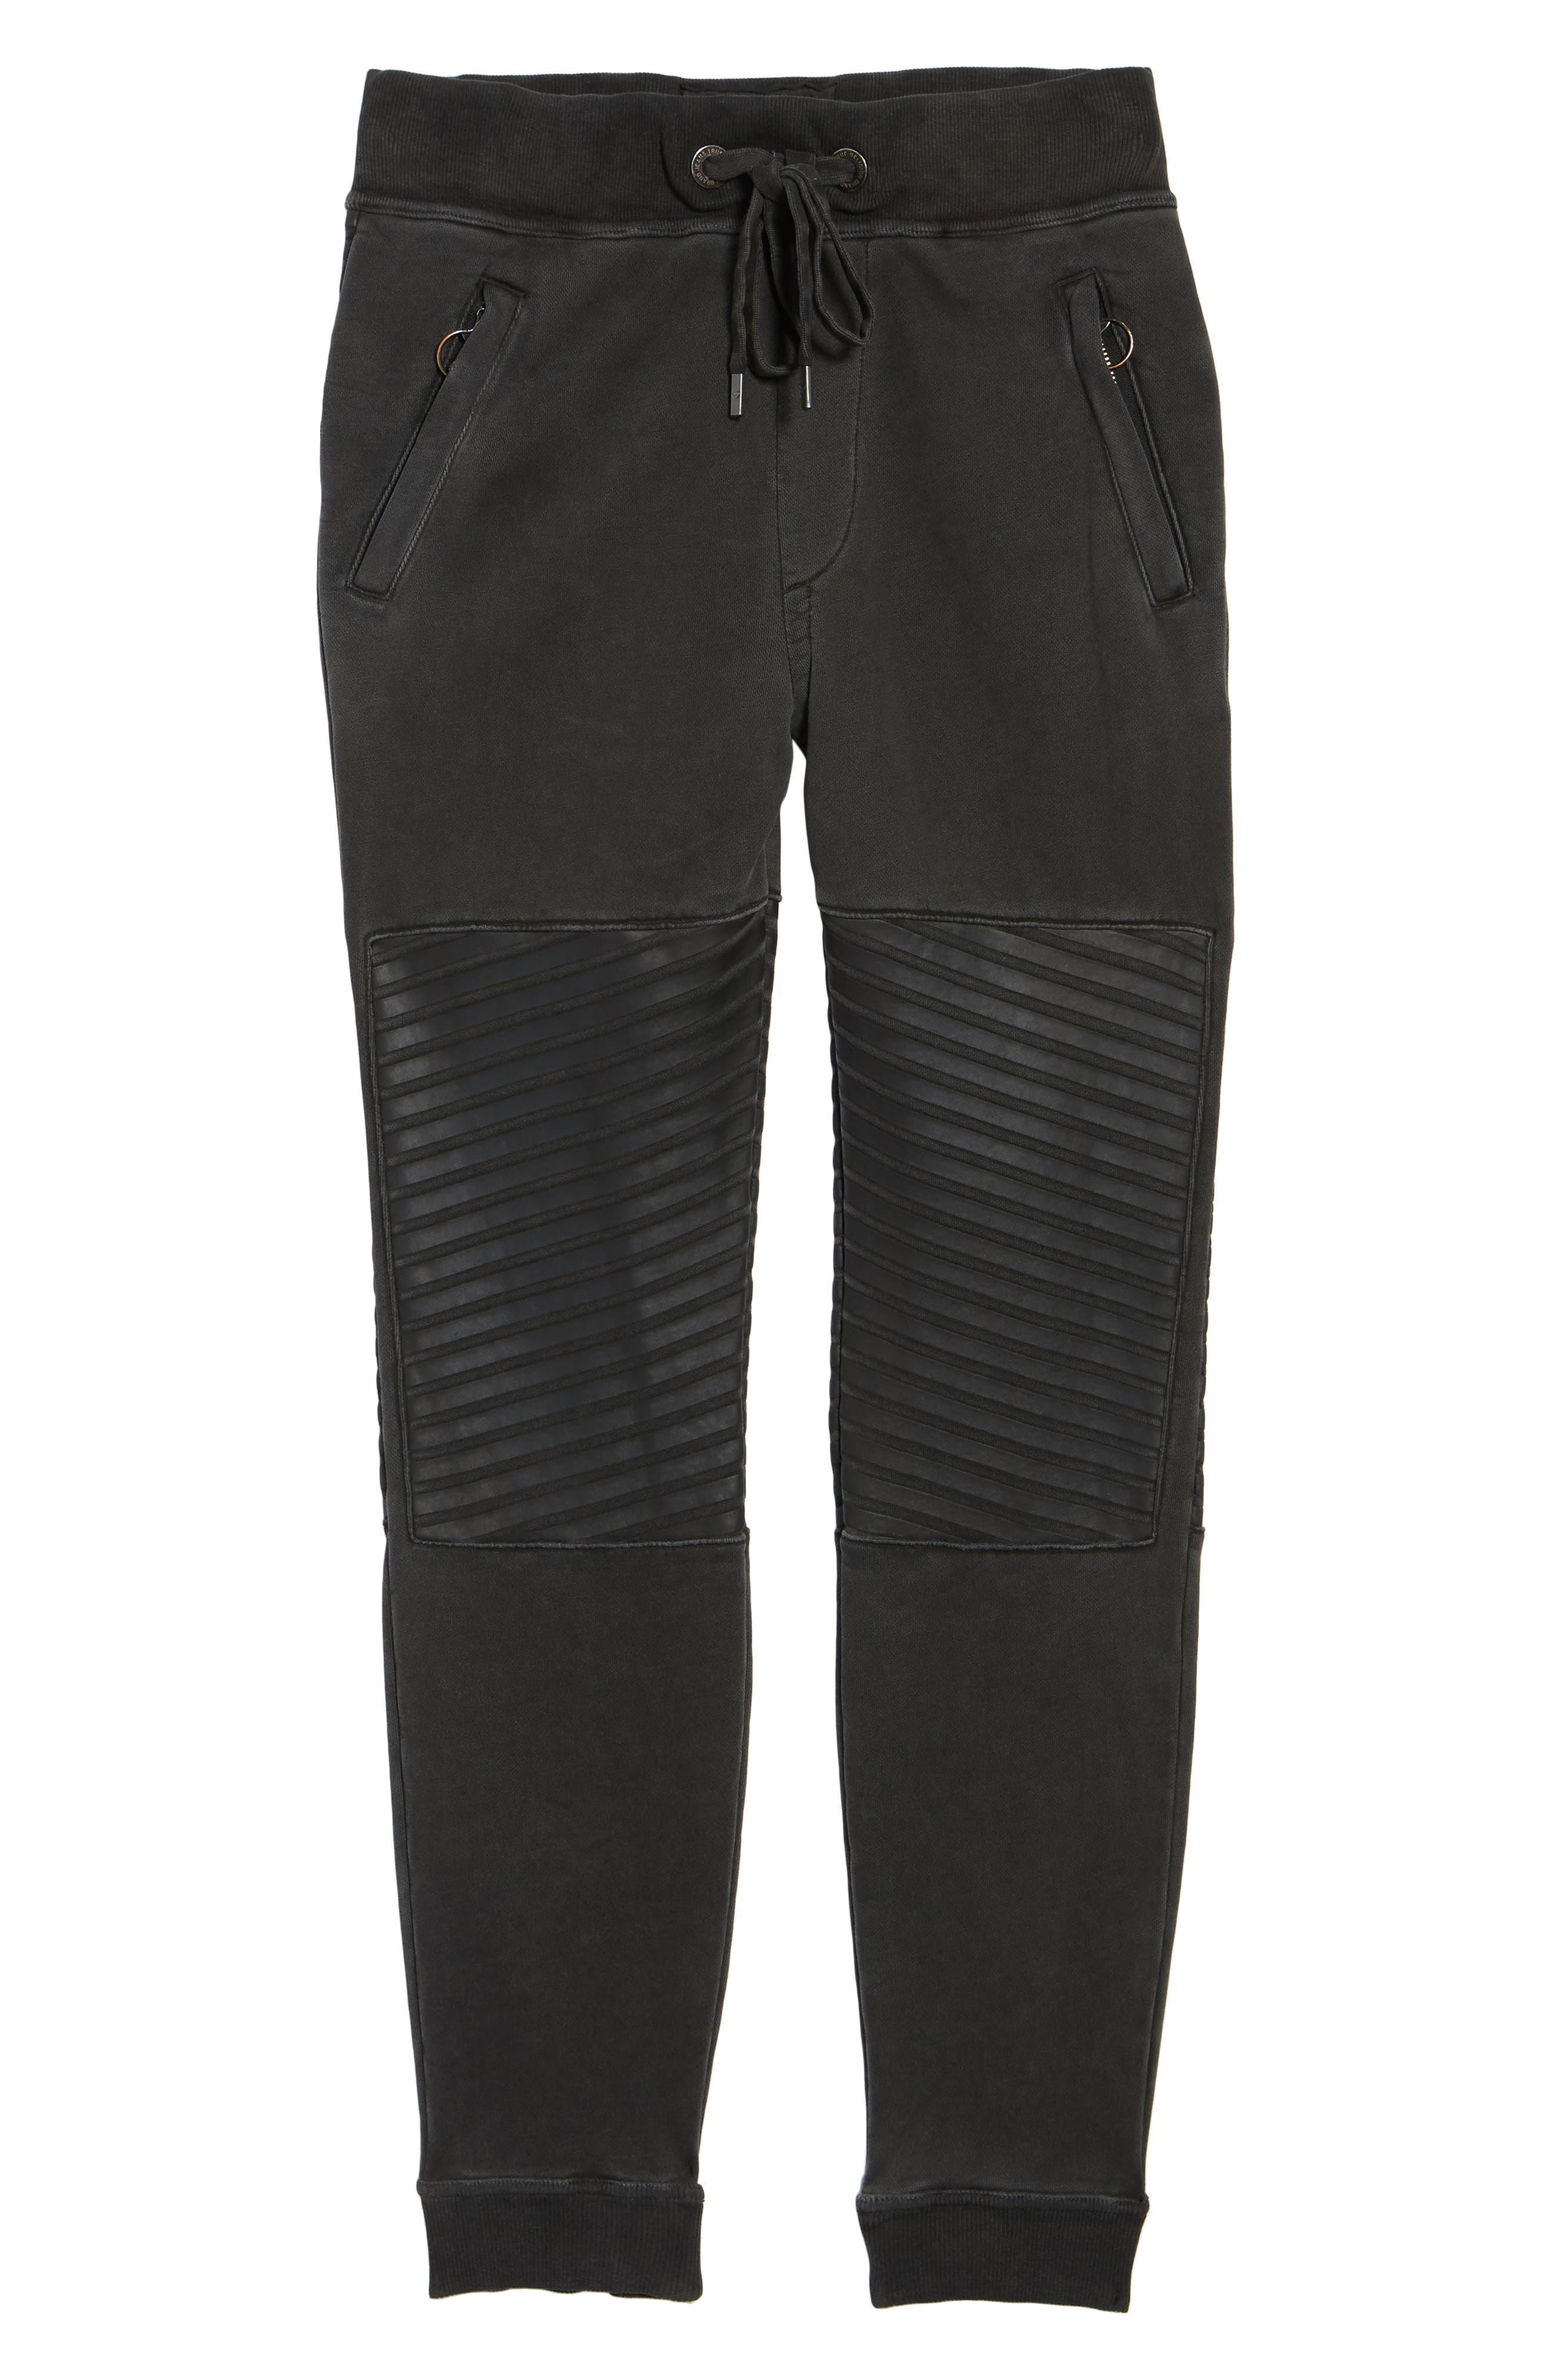 Moto Sweatpants,                             Alternate thumbnail 6, color,                             001